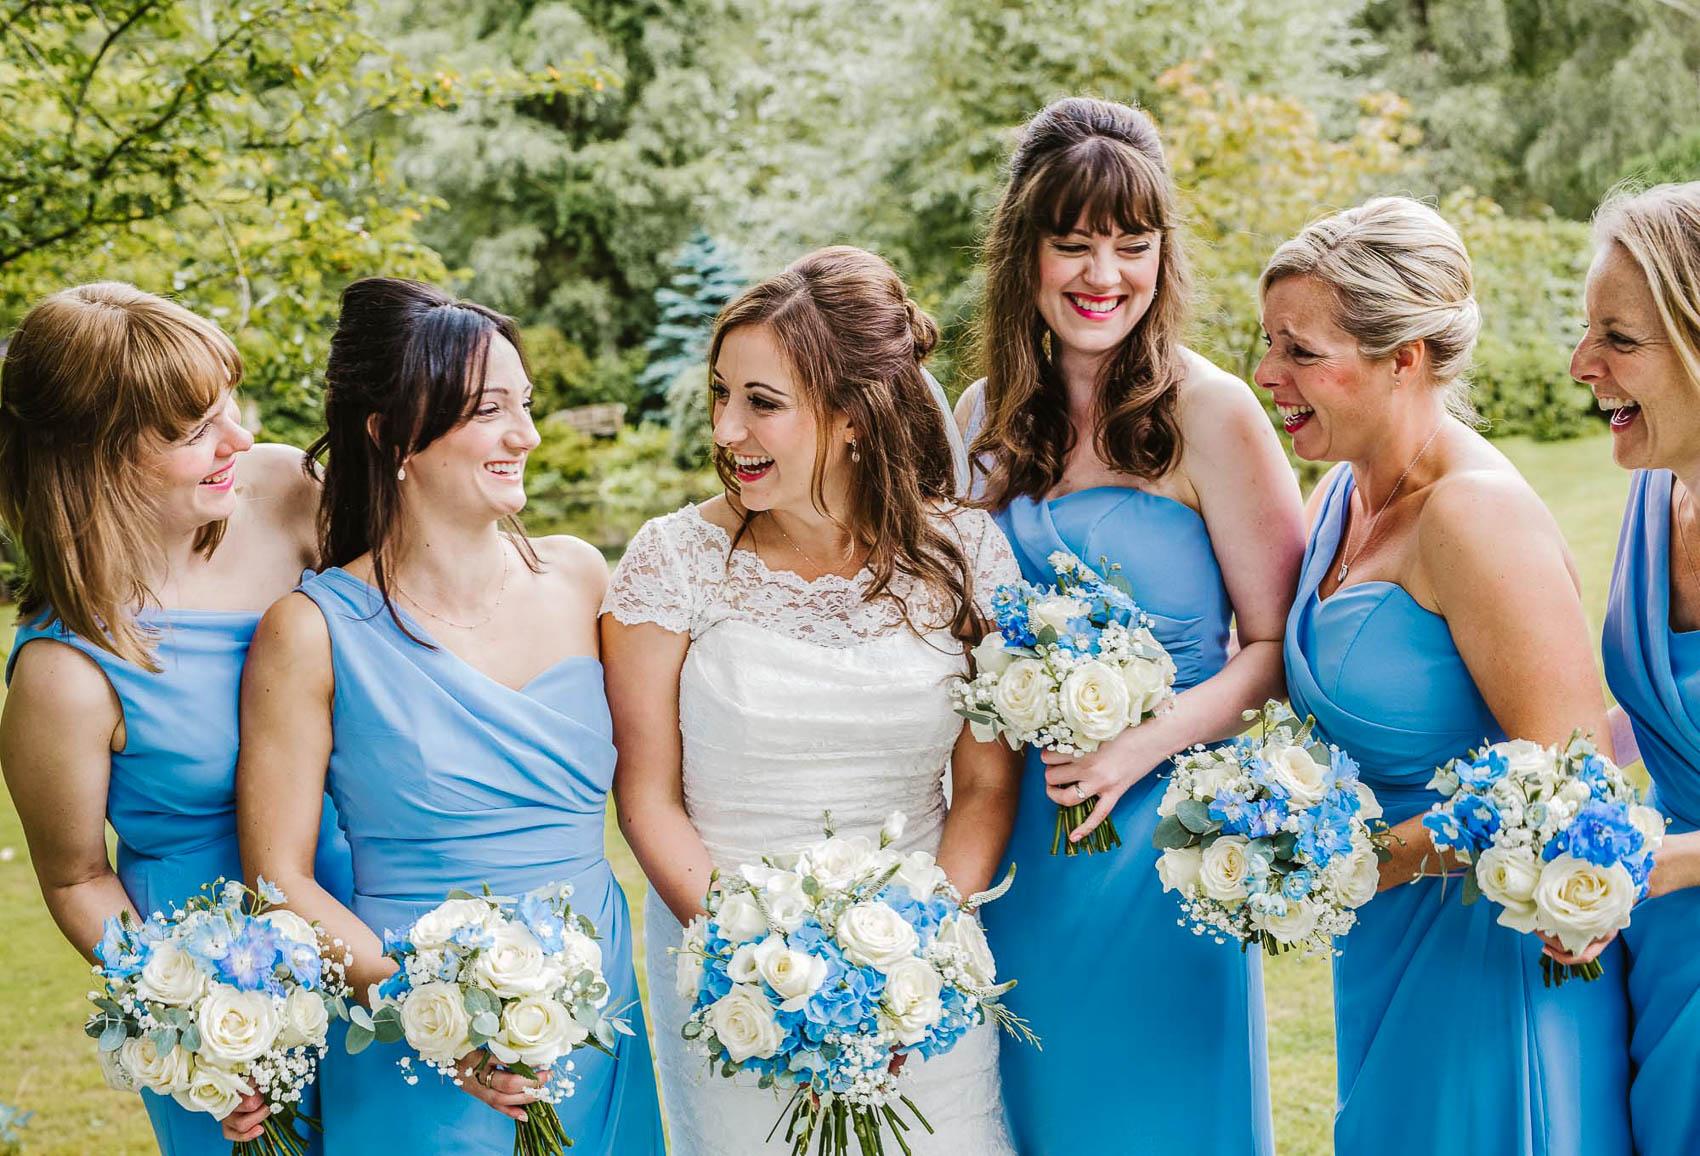 Rivervale Barn Wedding Photographer - Oli and Leyla 29